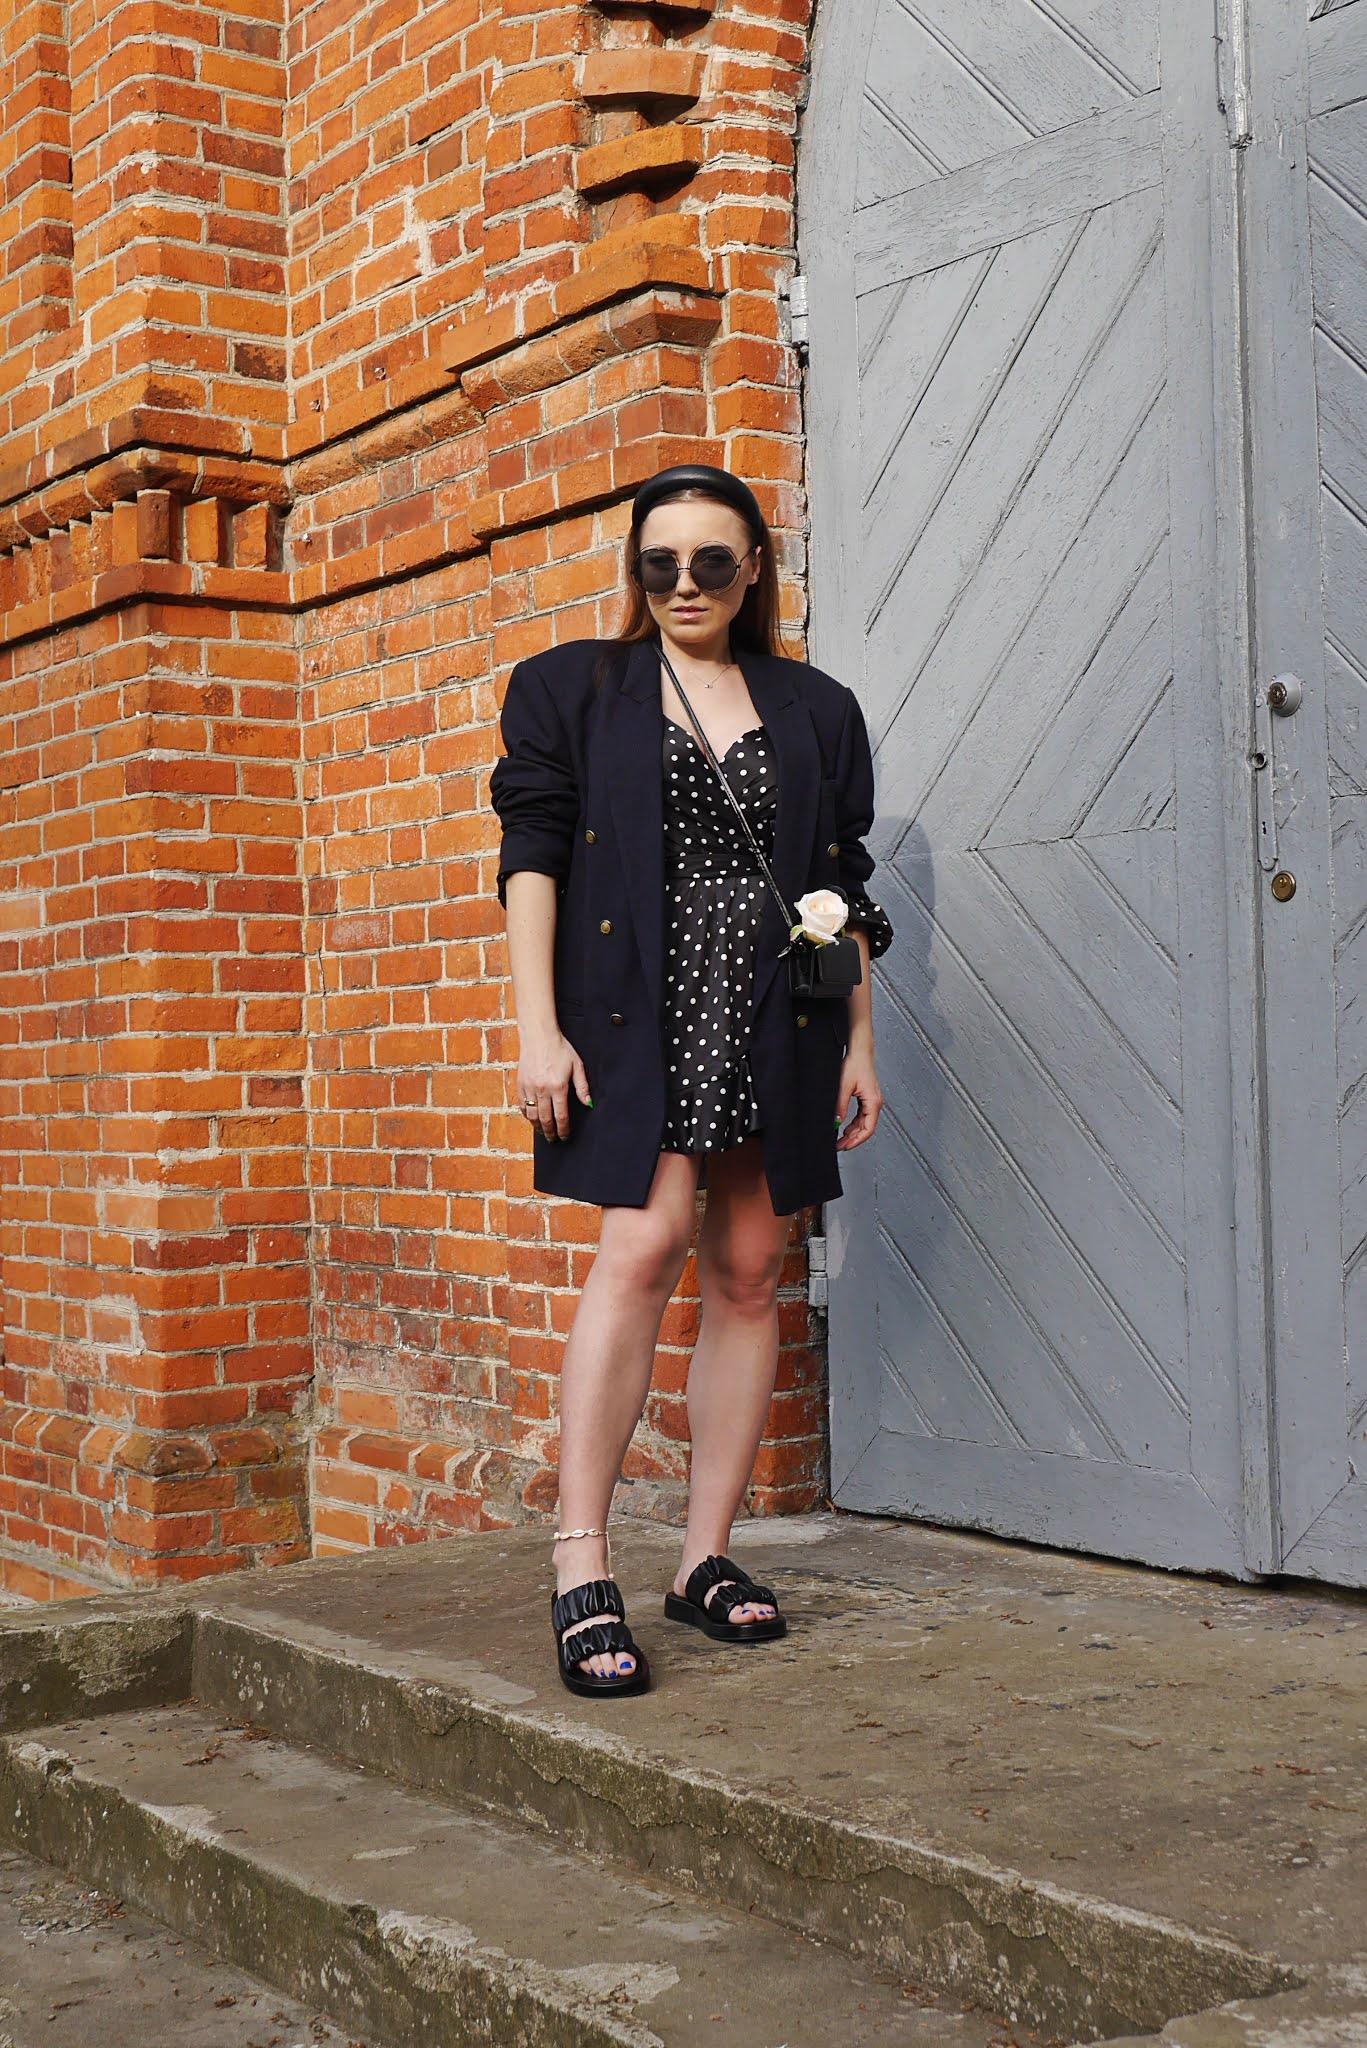 fashion blogger polka dot dress femme luxe black flipflop sunglasses karyn puławy outfit ootd inspration